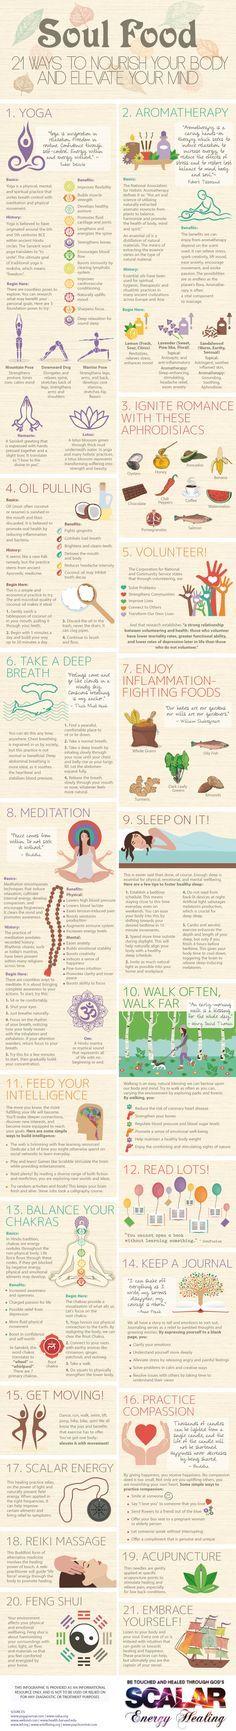 Soul Food: 21 Ways to Nourish You